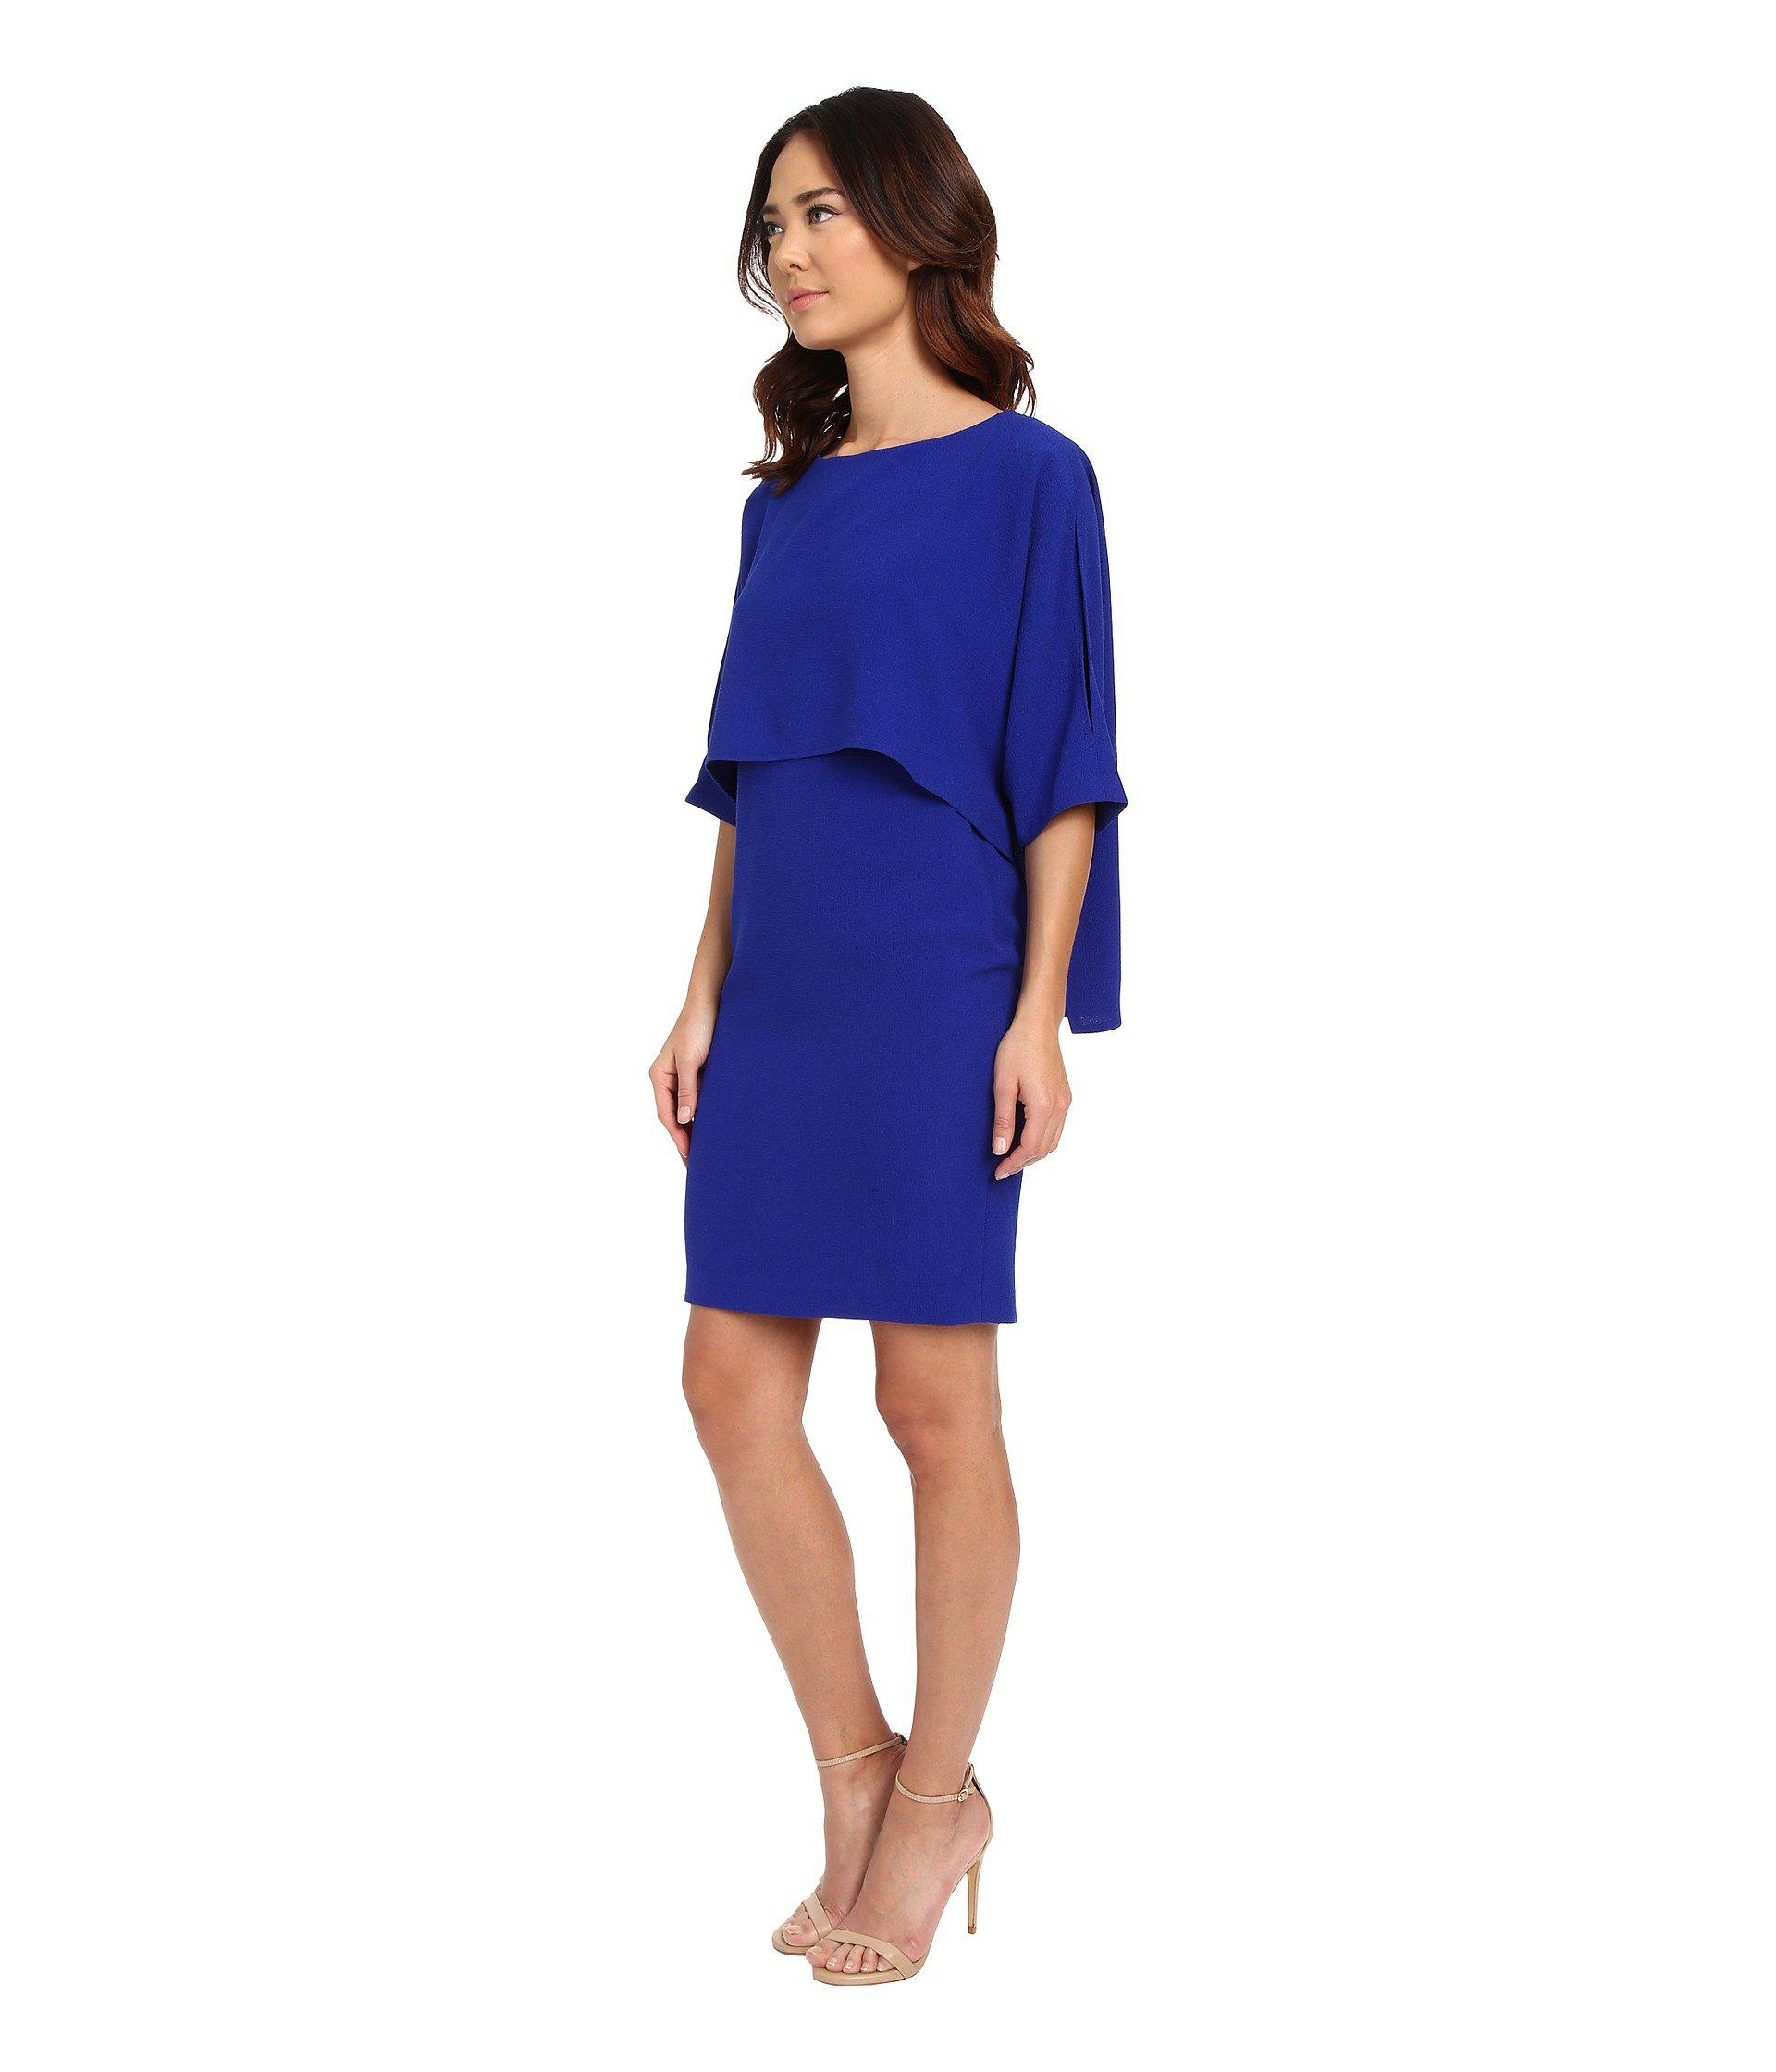 ba7dd45c Adrianna Papell Draped Blouson Sheath Dress in Blue - Lyst